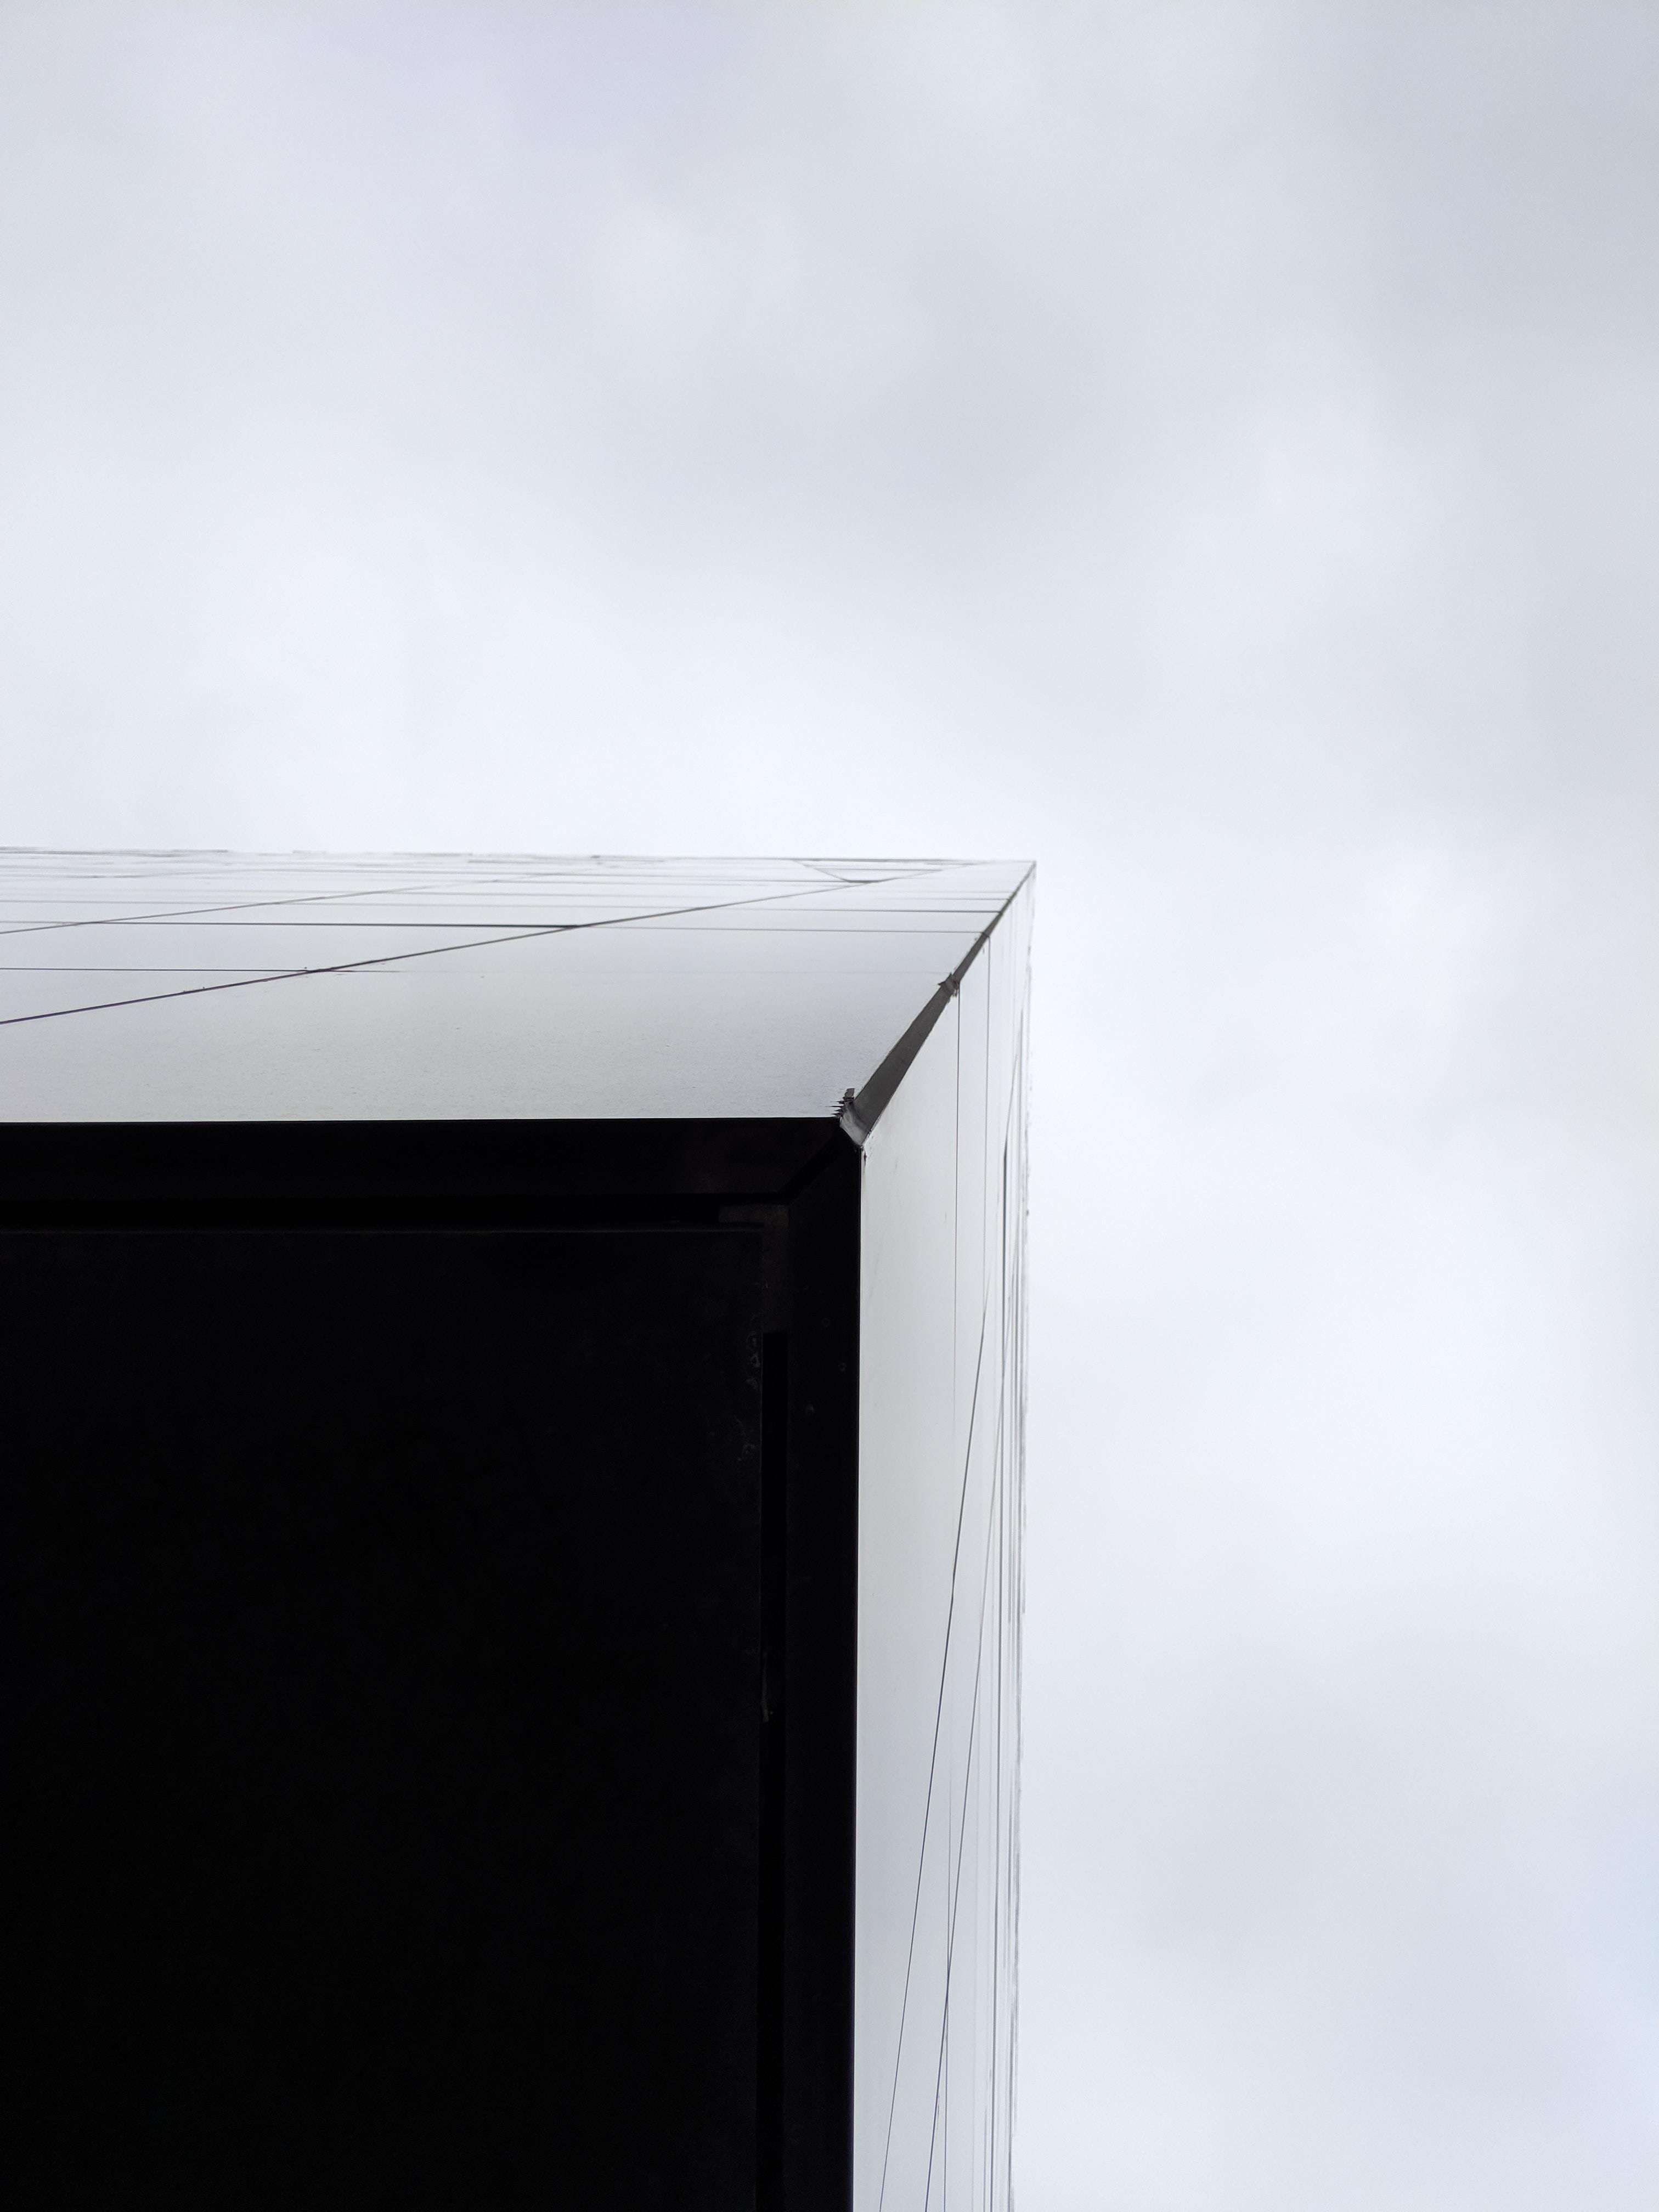 low angle photography of gray sky